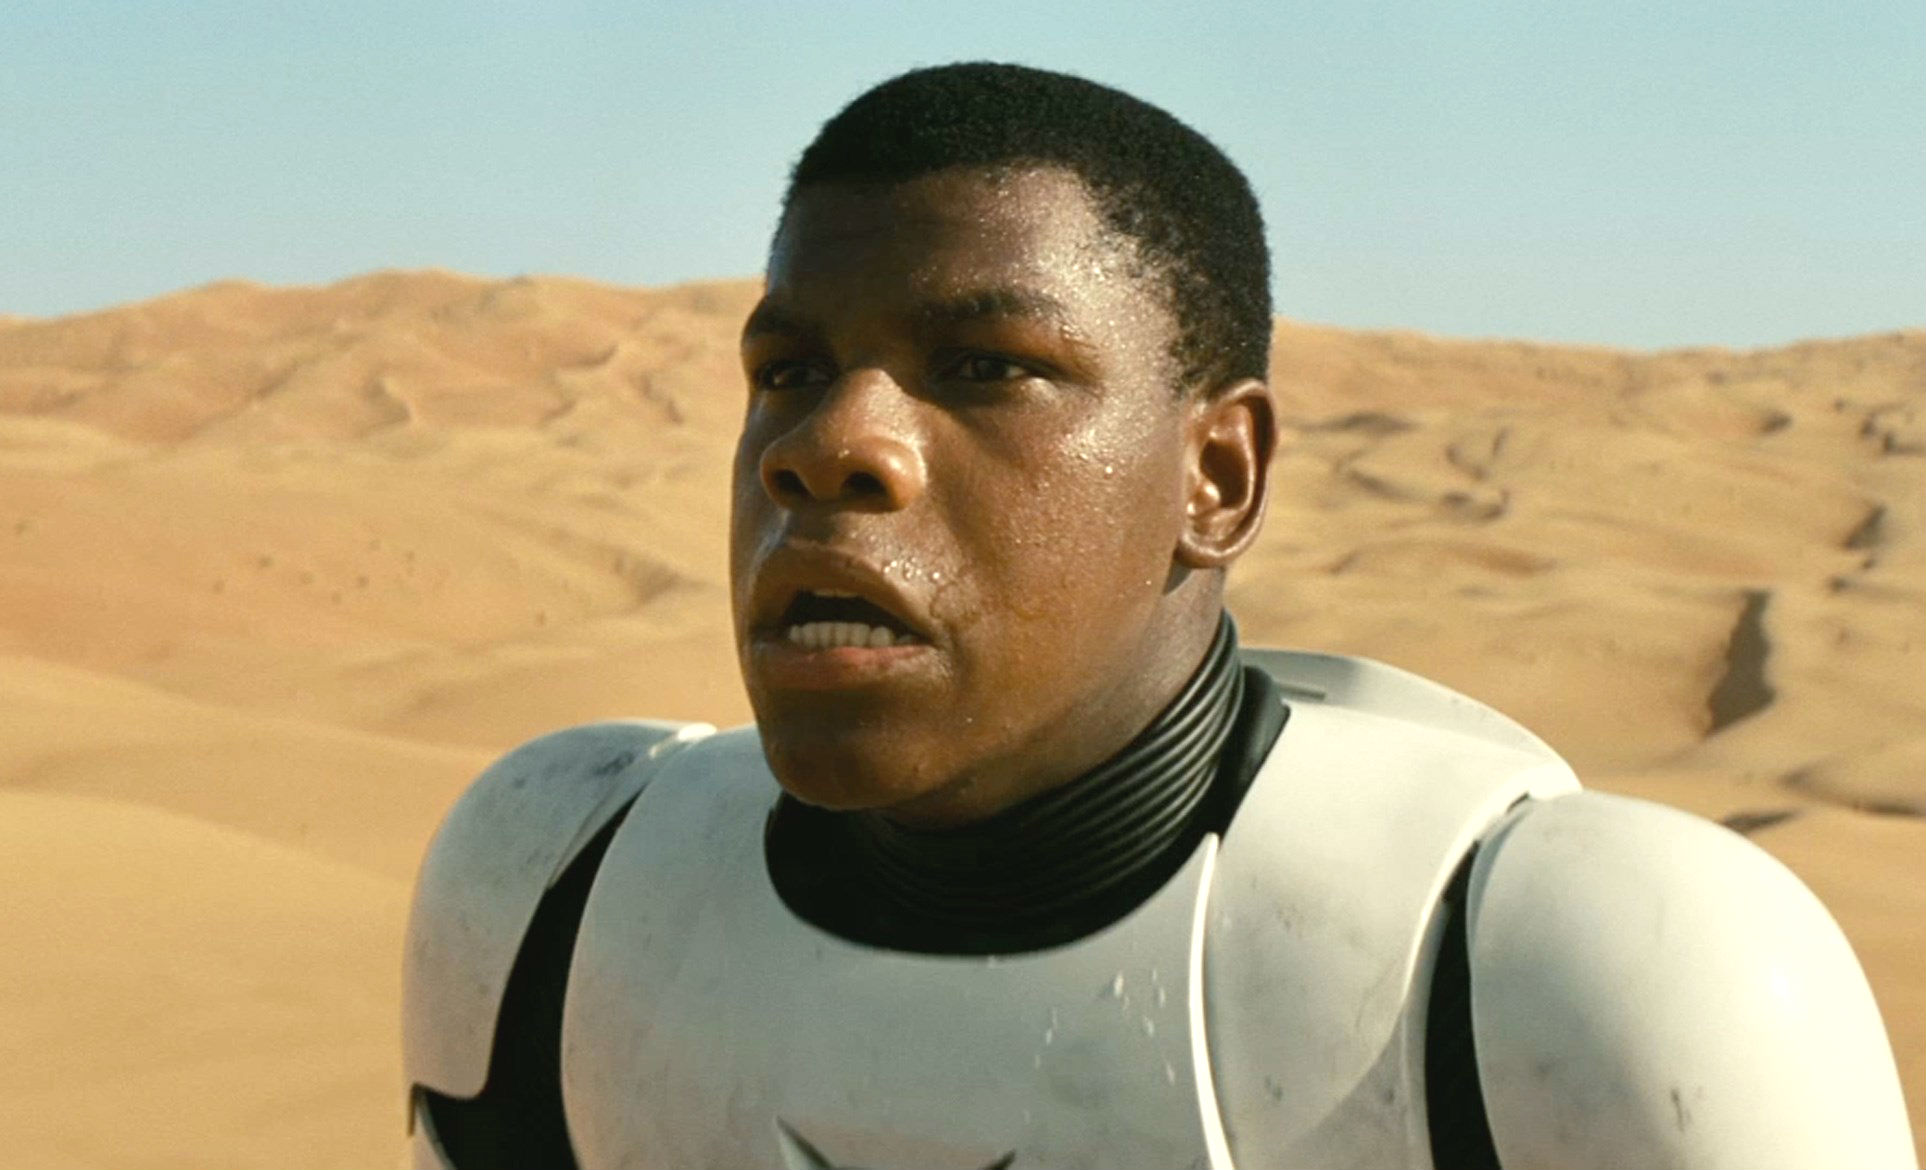 Star Wars The Force Awakens trailer screengrab John Boyega